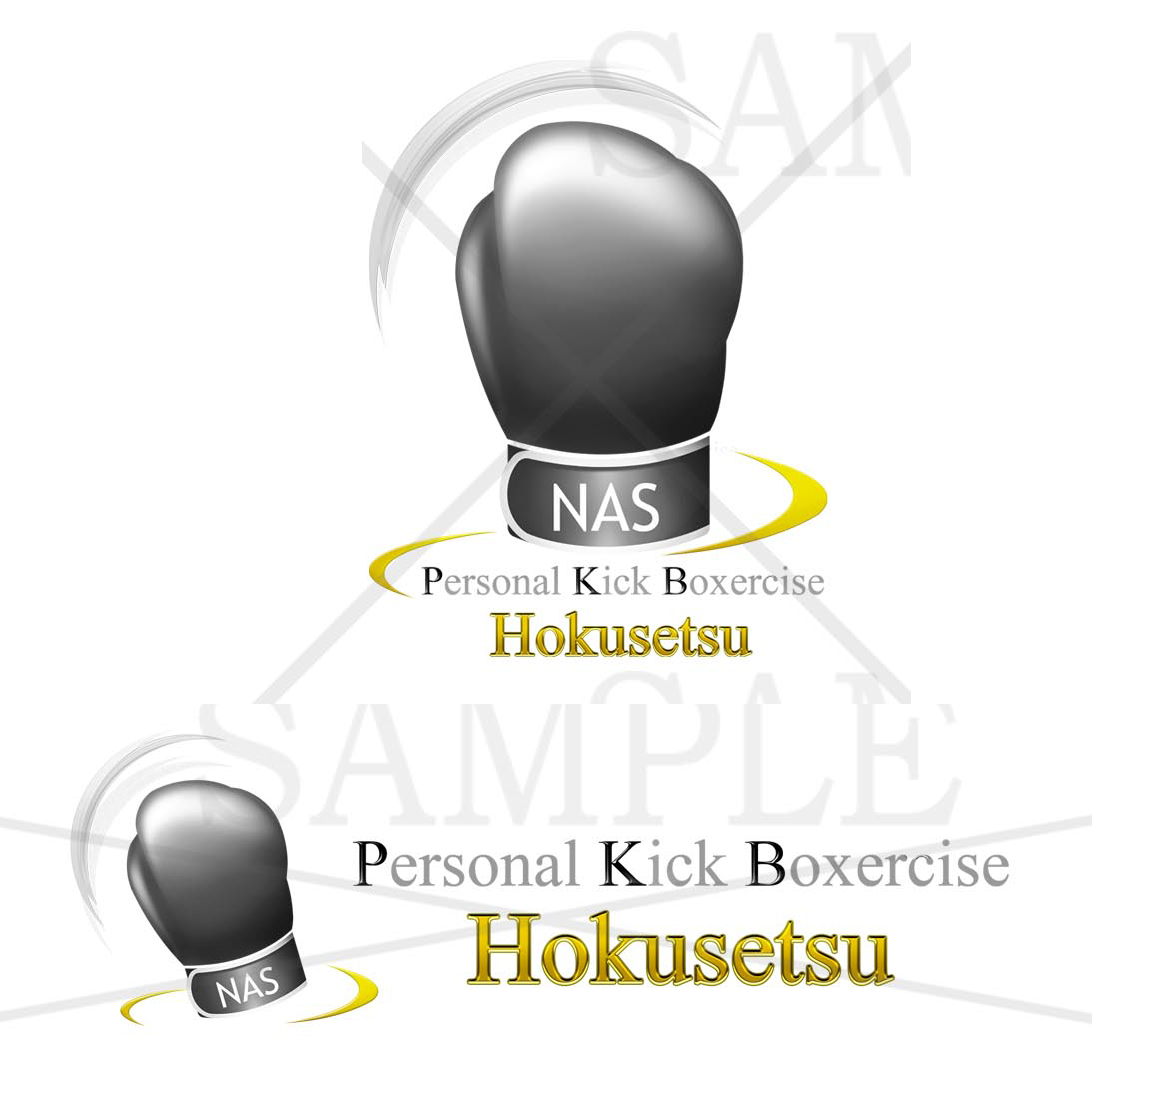 Kick Boxercise rogo